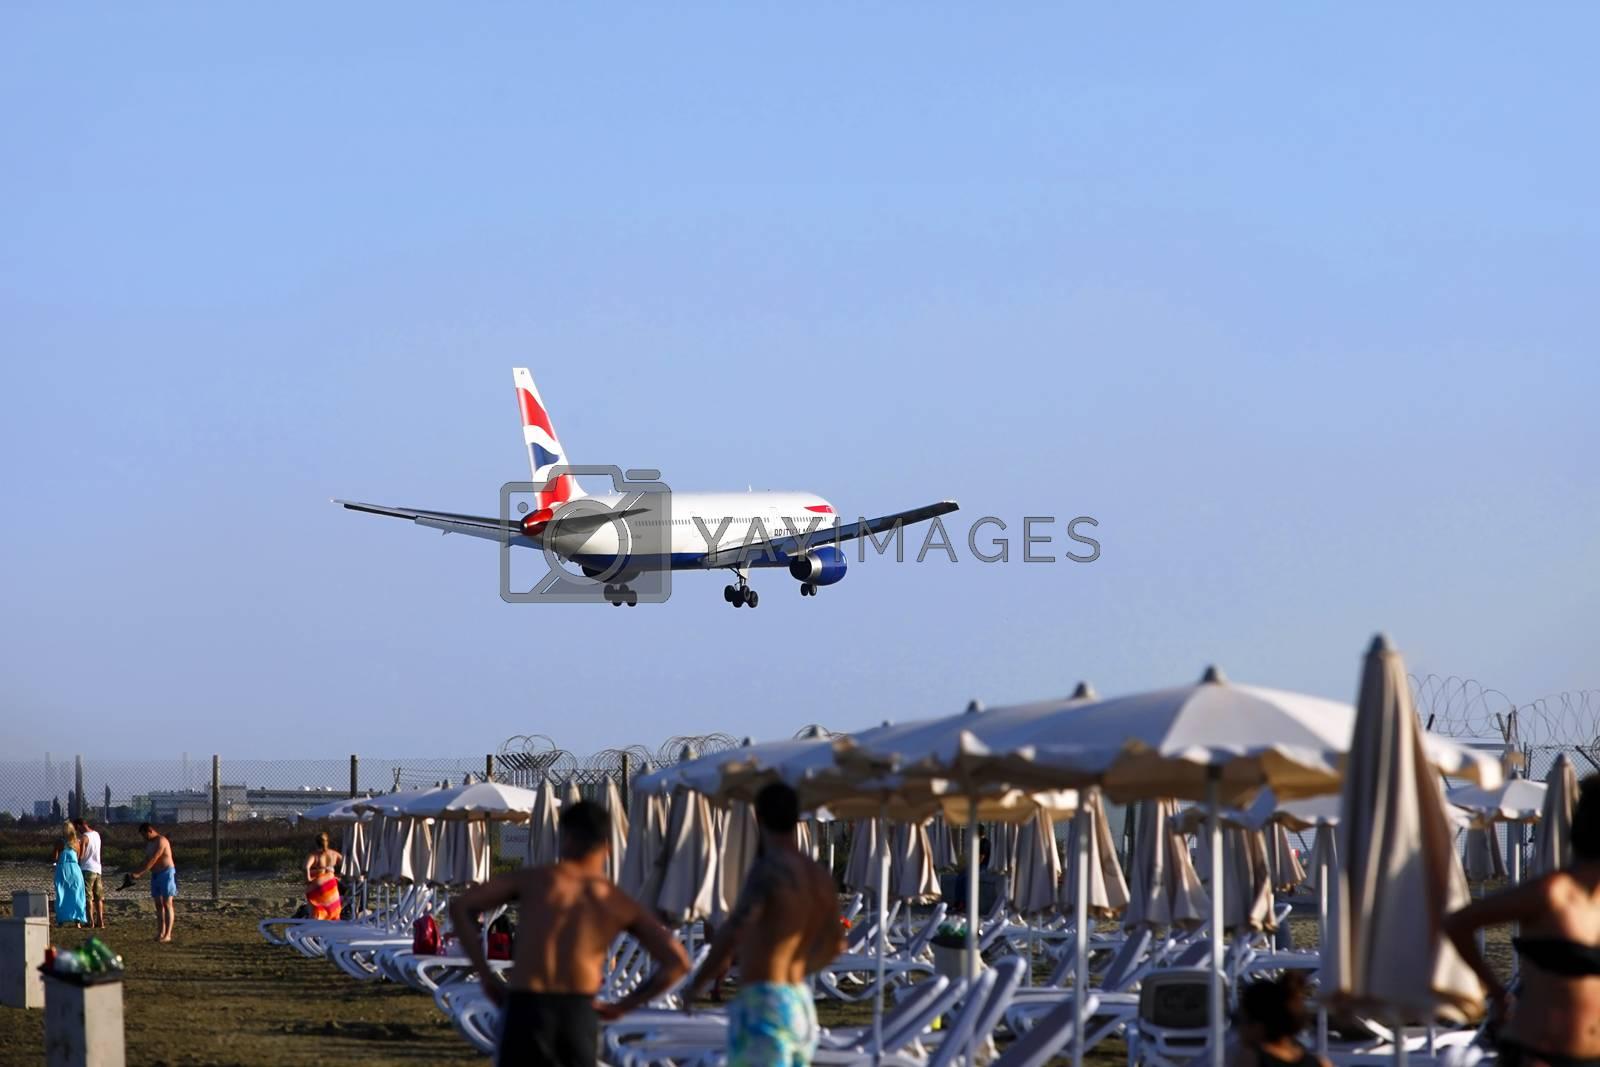 Larnaca, Cyprus - May 22, 2016: British Airways Airbus A320 landing at Larnaca International Airport